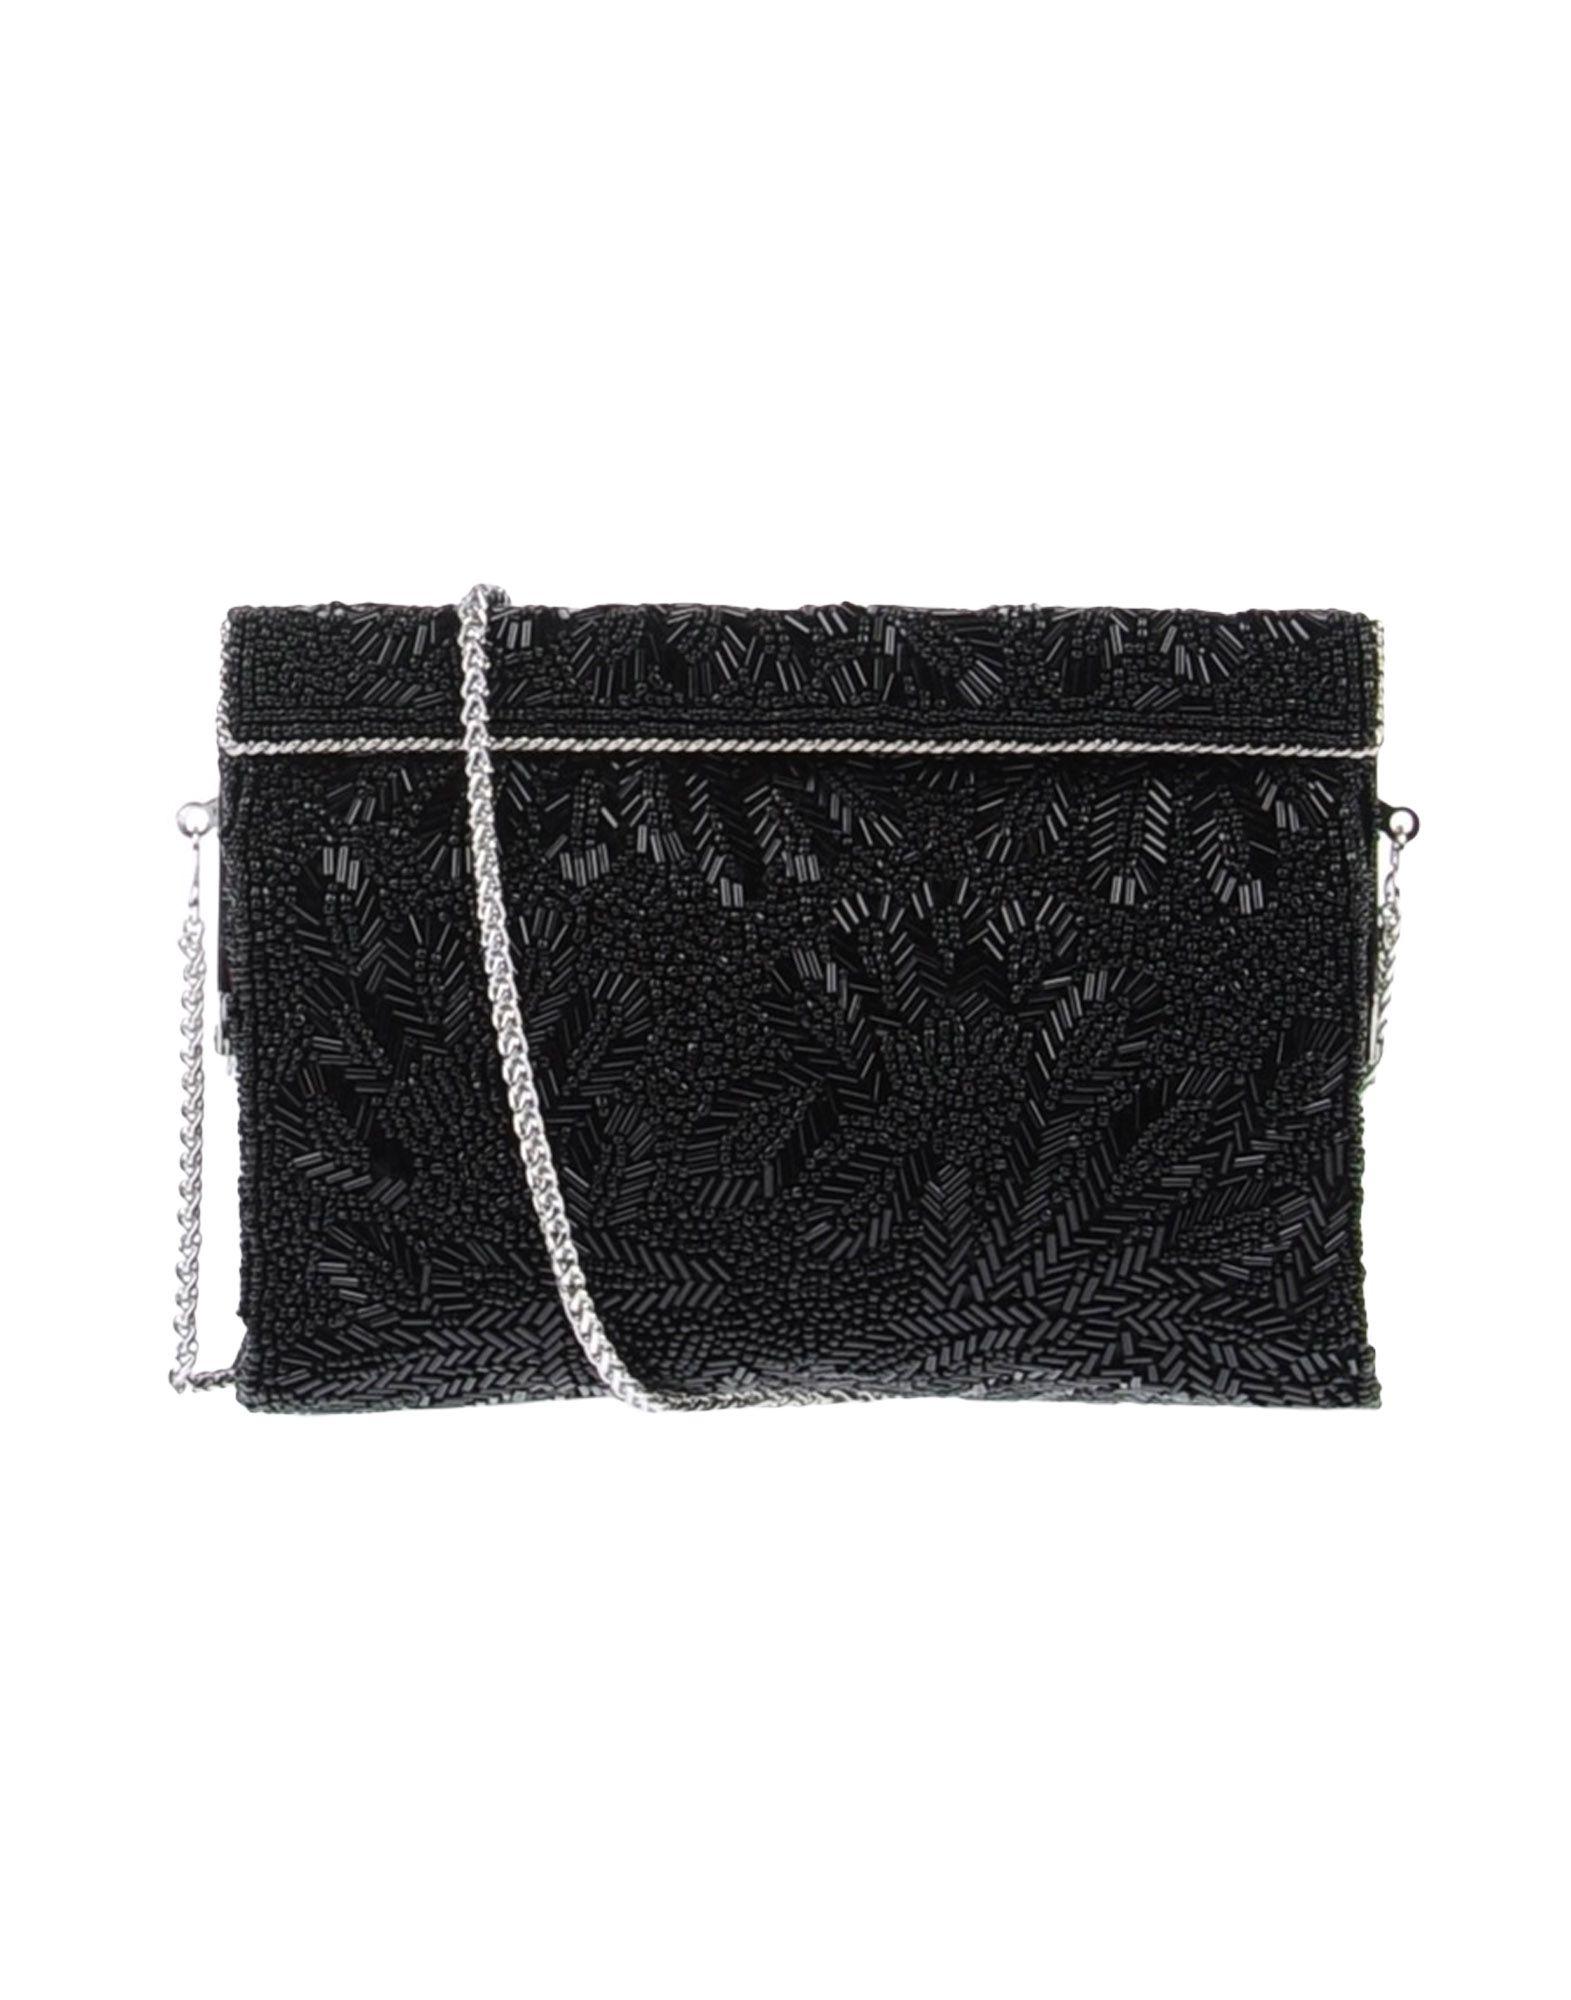 NINA New York Сумка через плечо сумка через плечо new brand shippment price s9e canvas big bag